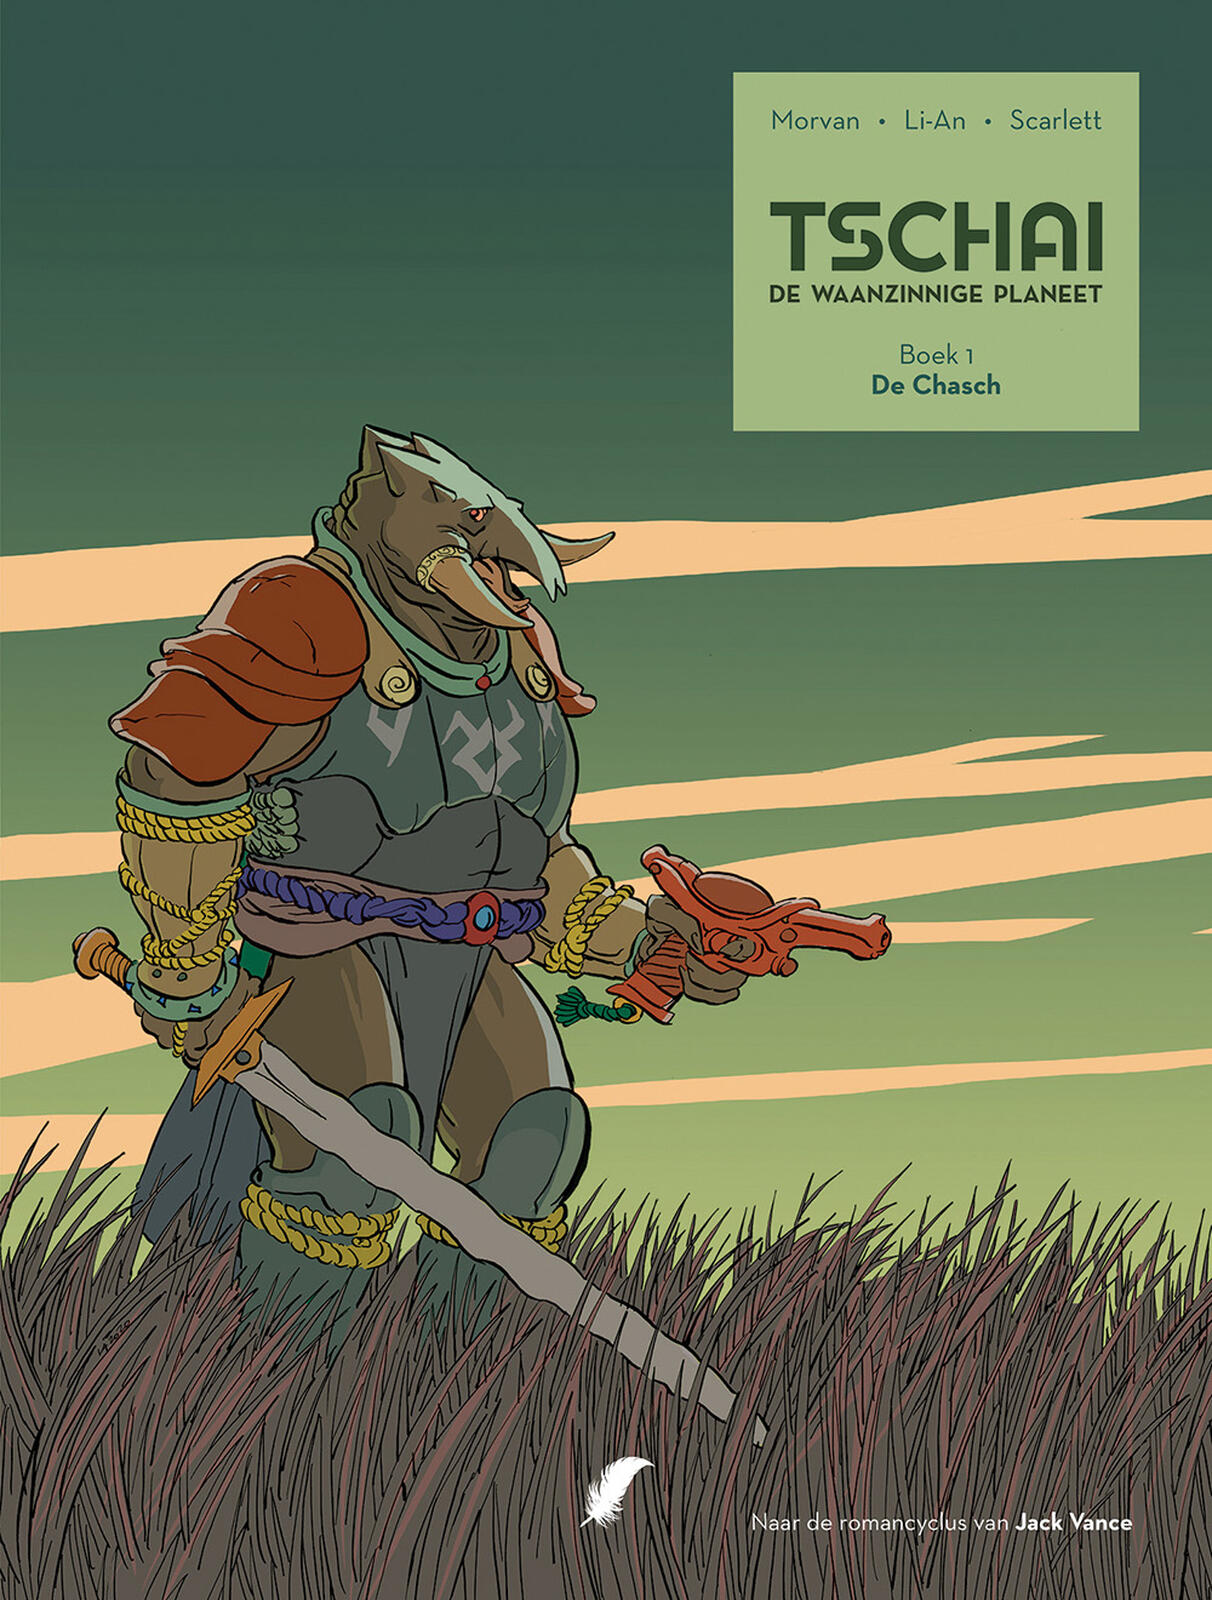 Tschai, De Waanzinnige Planeet integraal 1- De Chasch